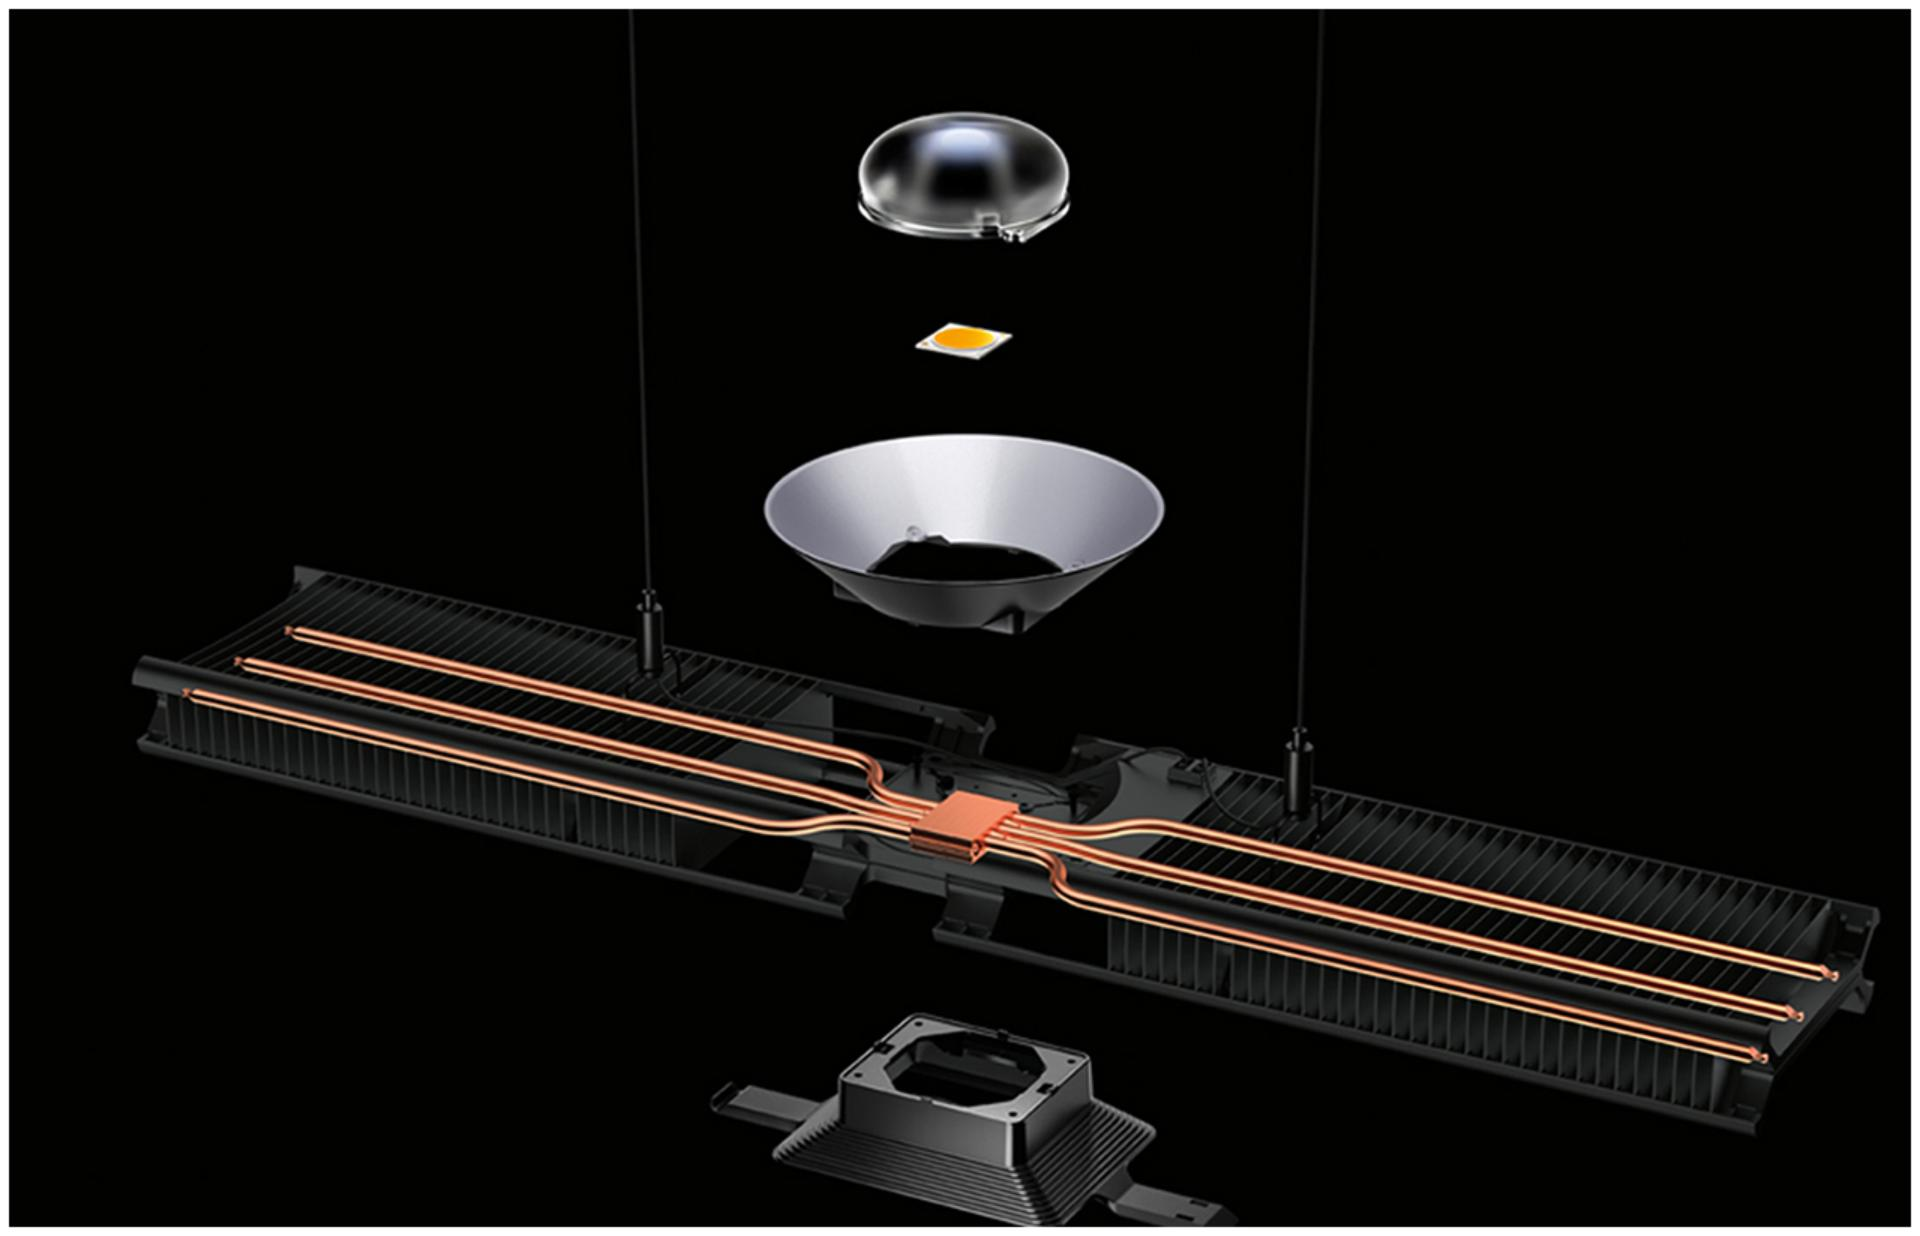 Heat pipe technology